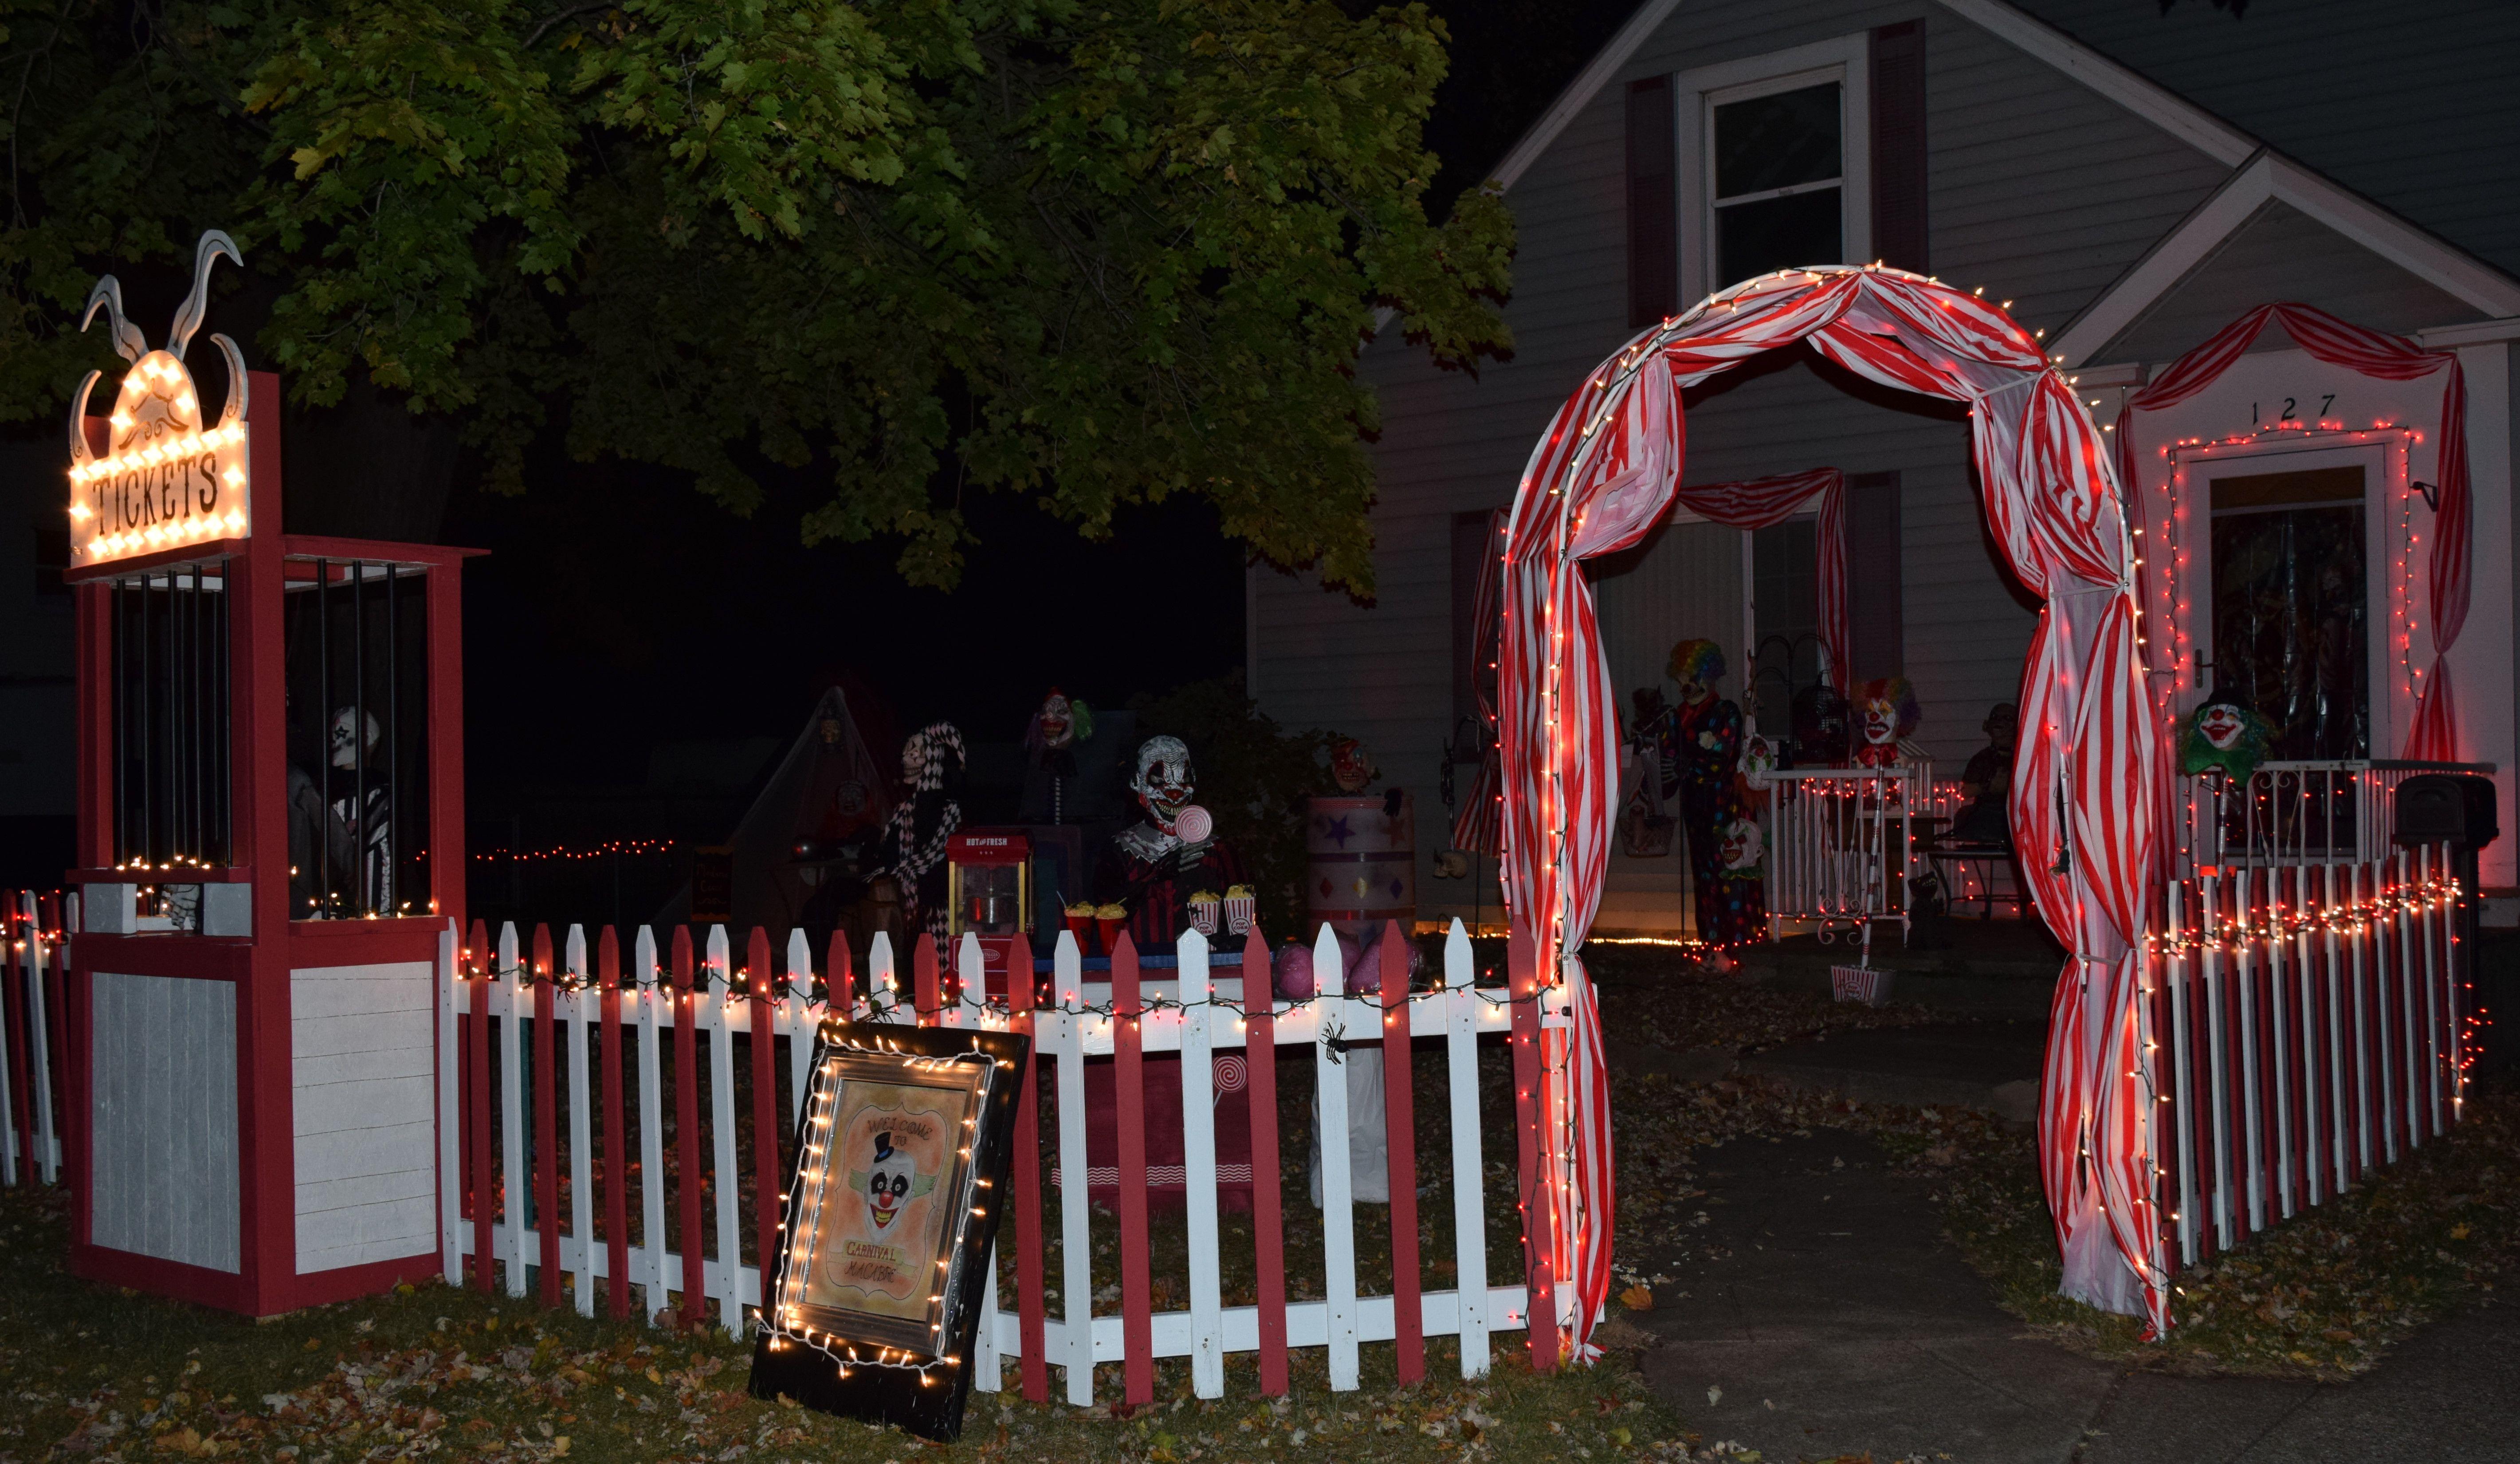 Halloween Outdoor Decoration Ideas 2020 Creepy clown halloween decorations | Halloween carnival